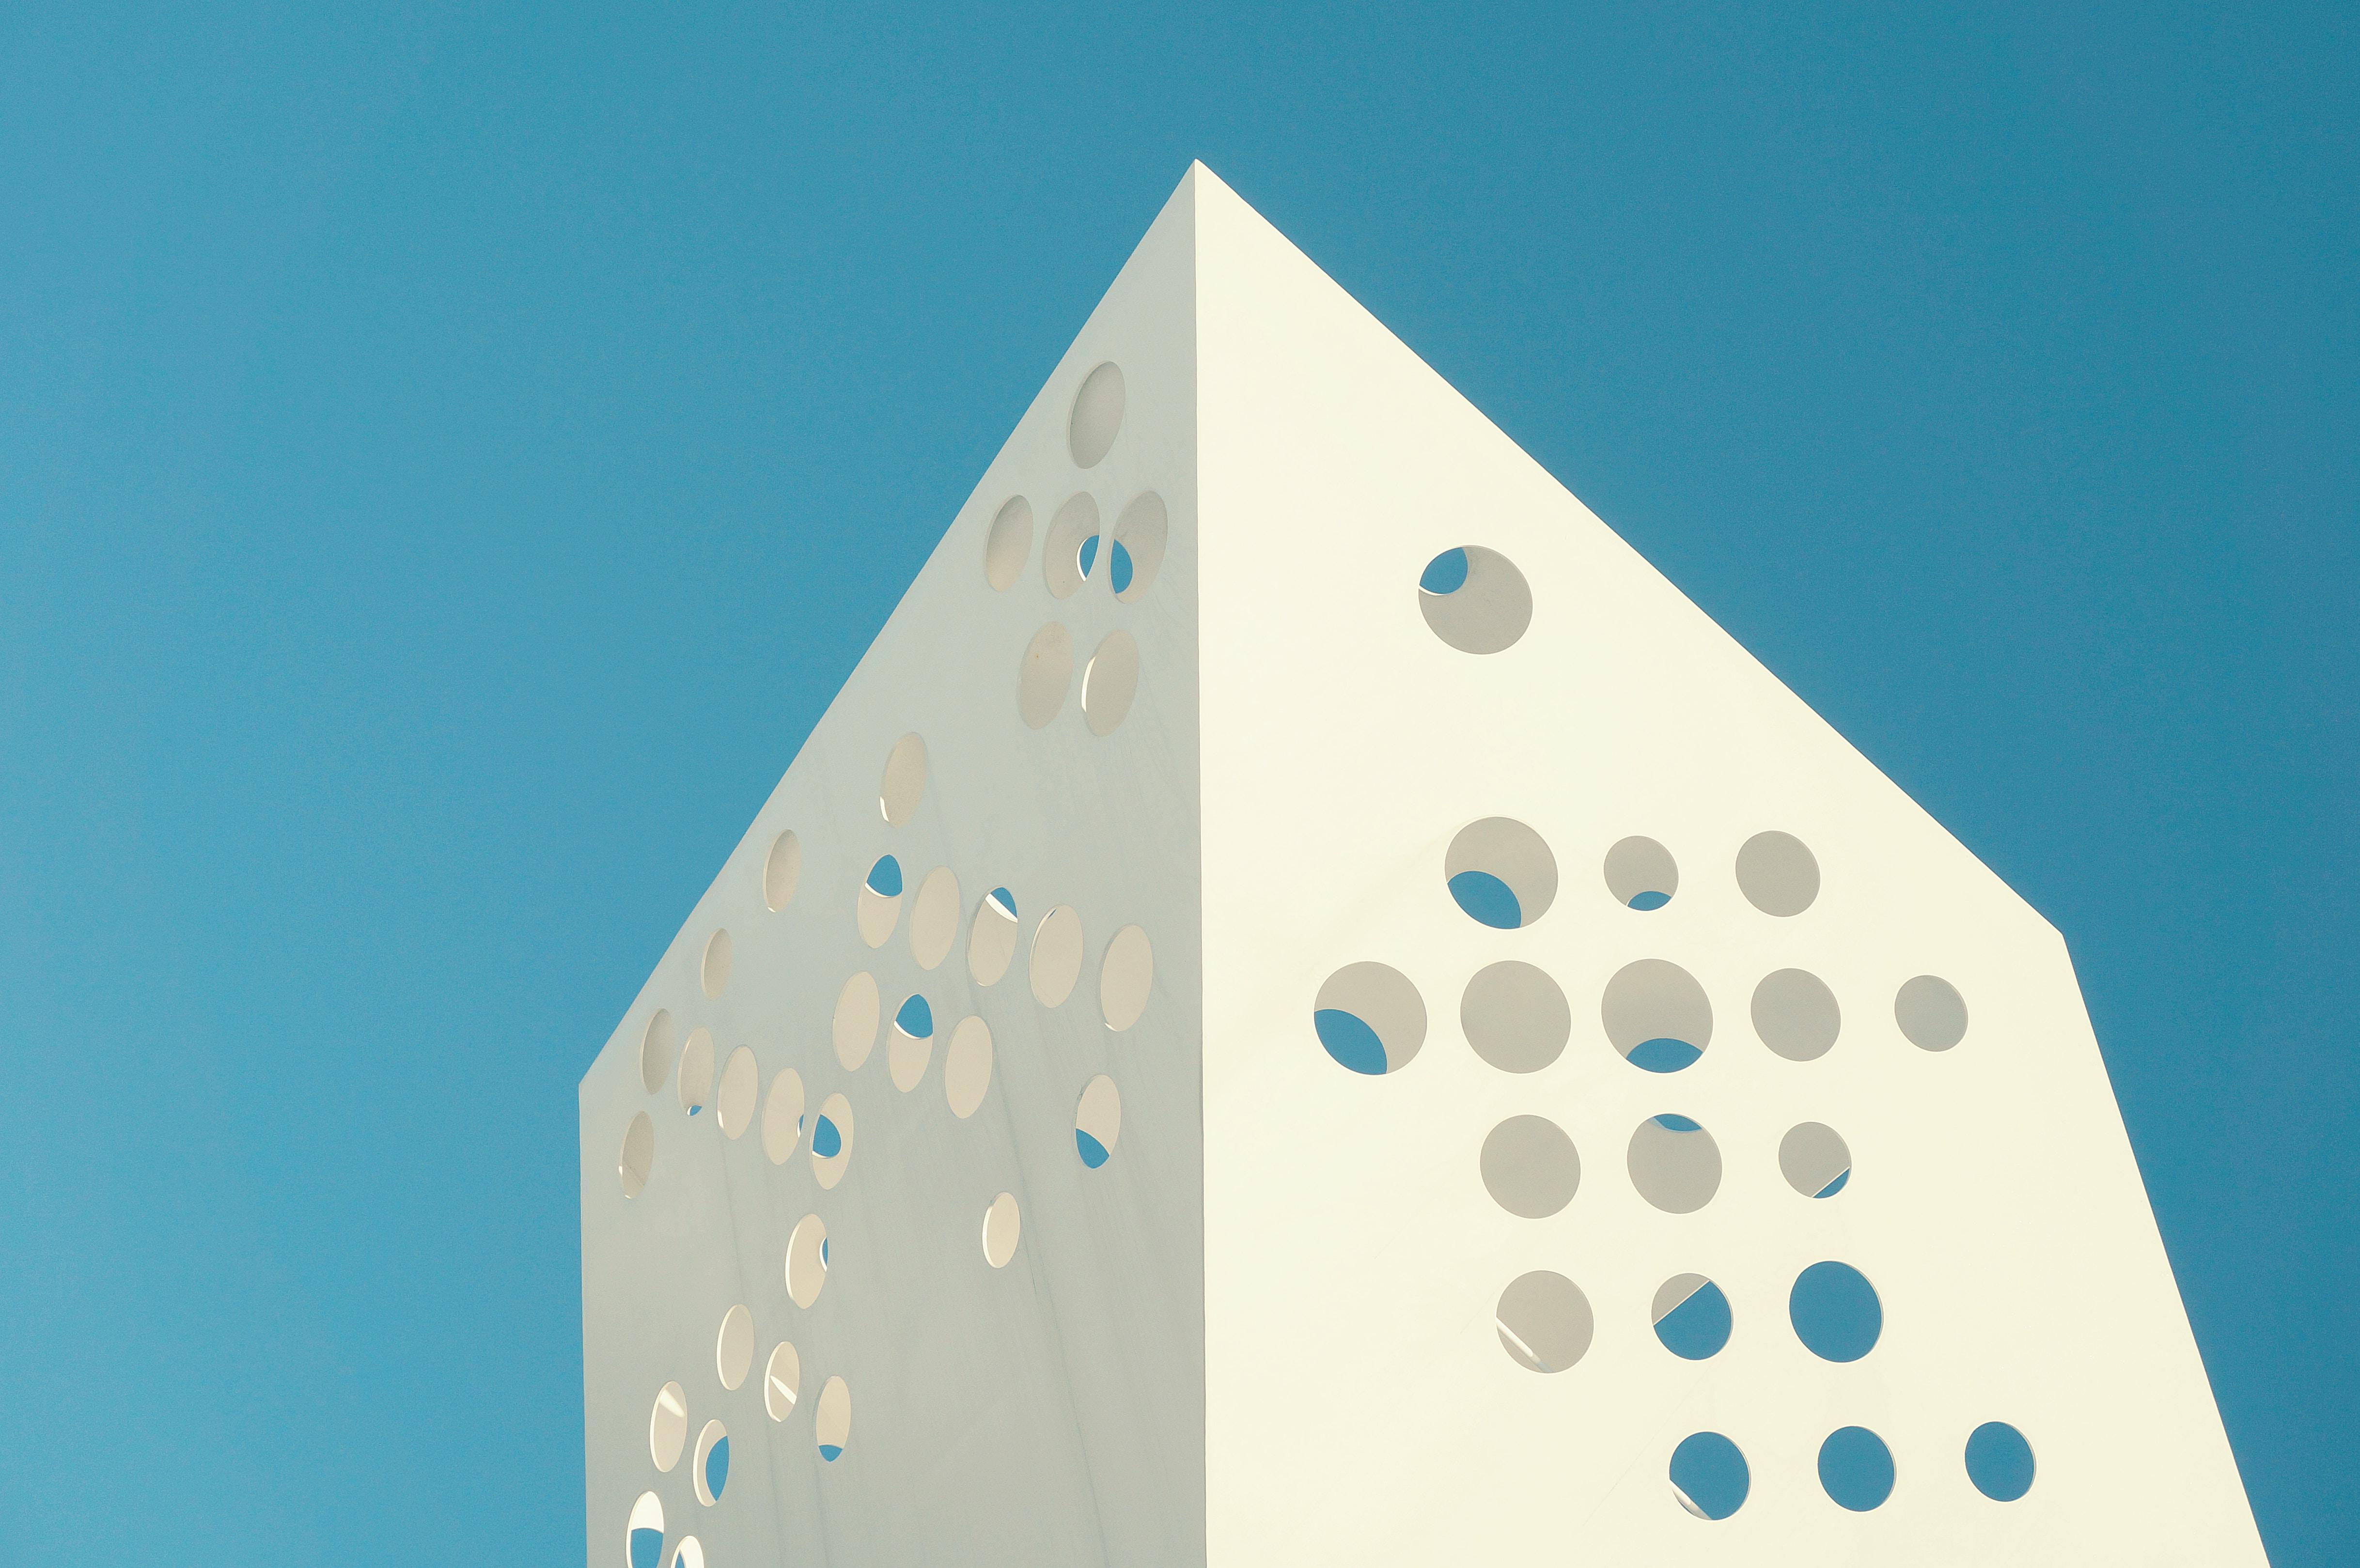 white and teal polka-dot wallpaper